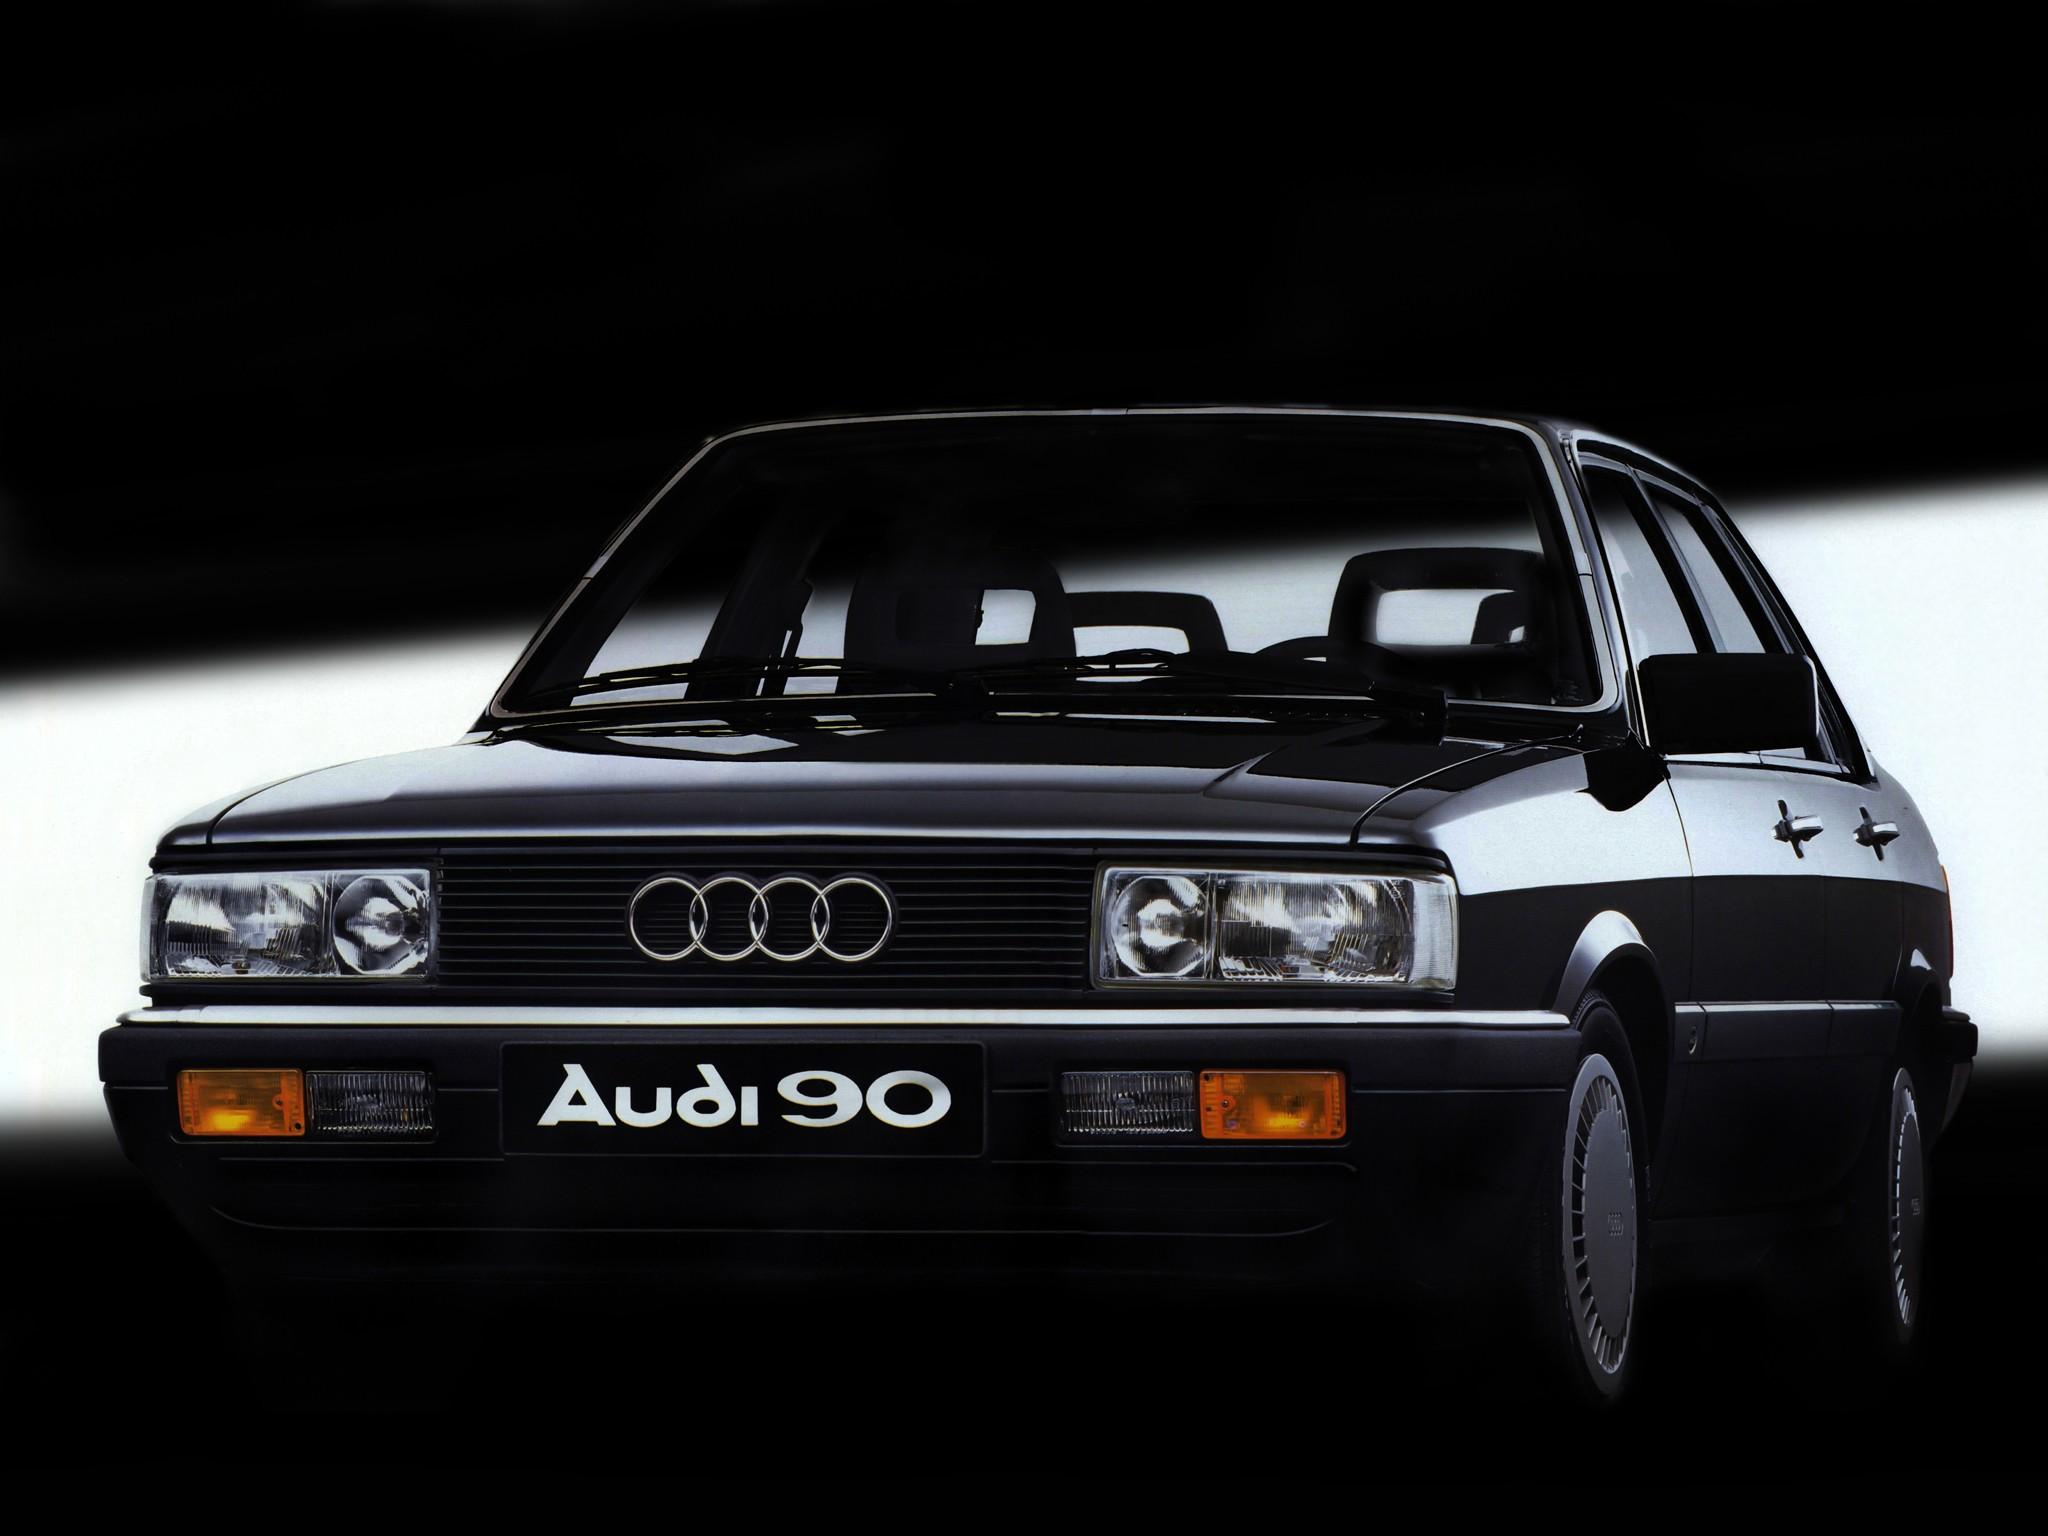 AUDI 90 (B2) specs & photos - 1984, 1985, 1986, 1987 - autoevolution